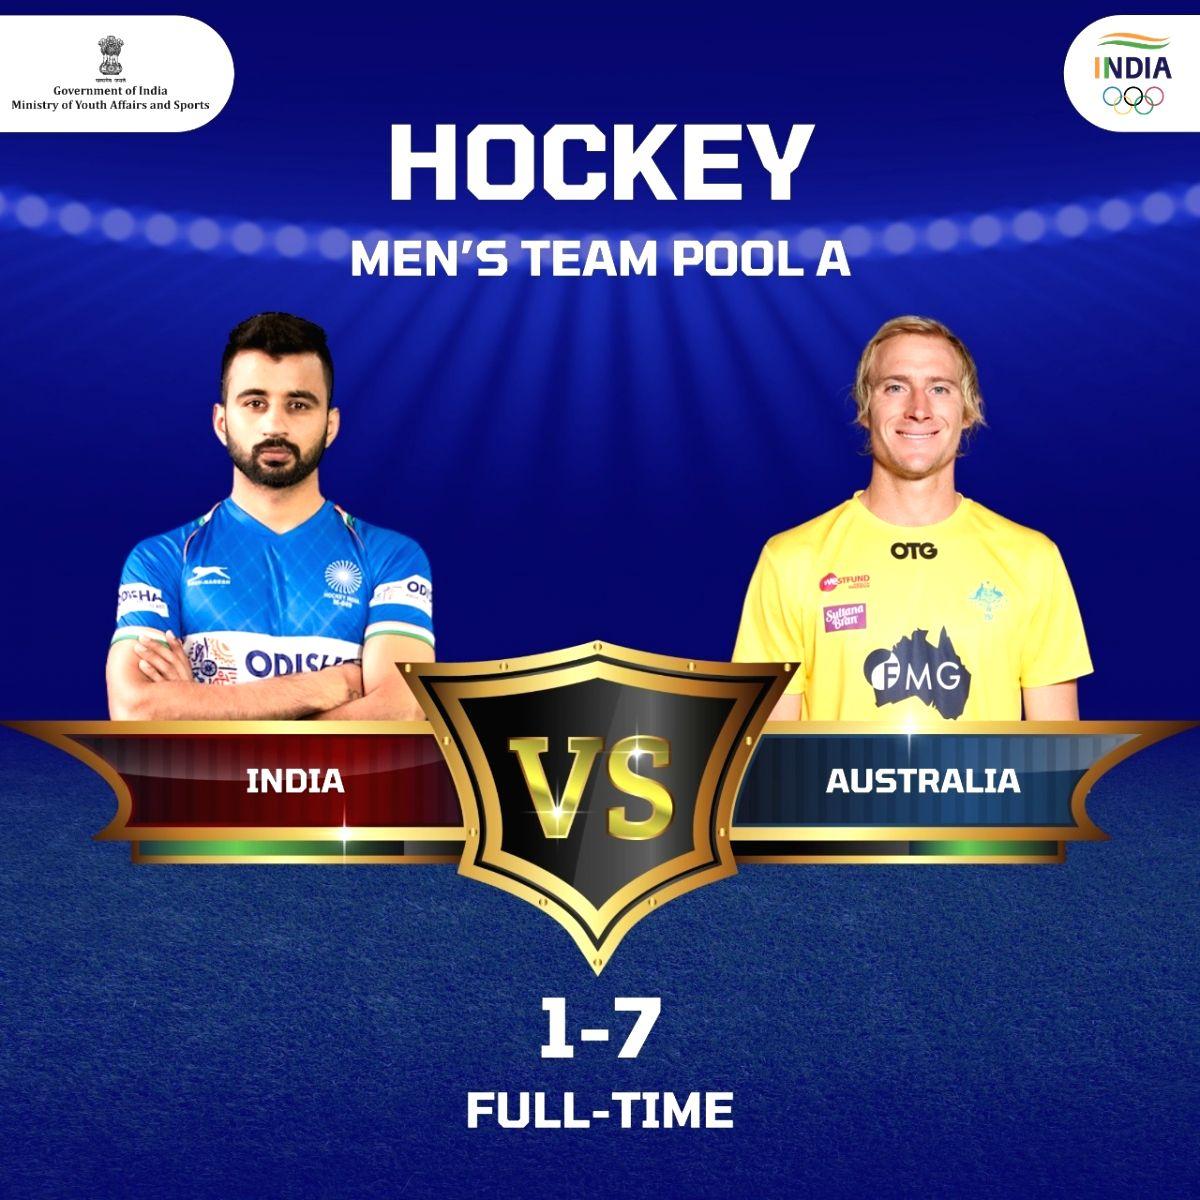 Hockey - India Vs Australiya, PS - SAI Media Twitter. ( Credit . SAI media/twitter)